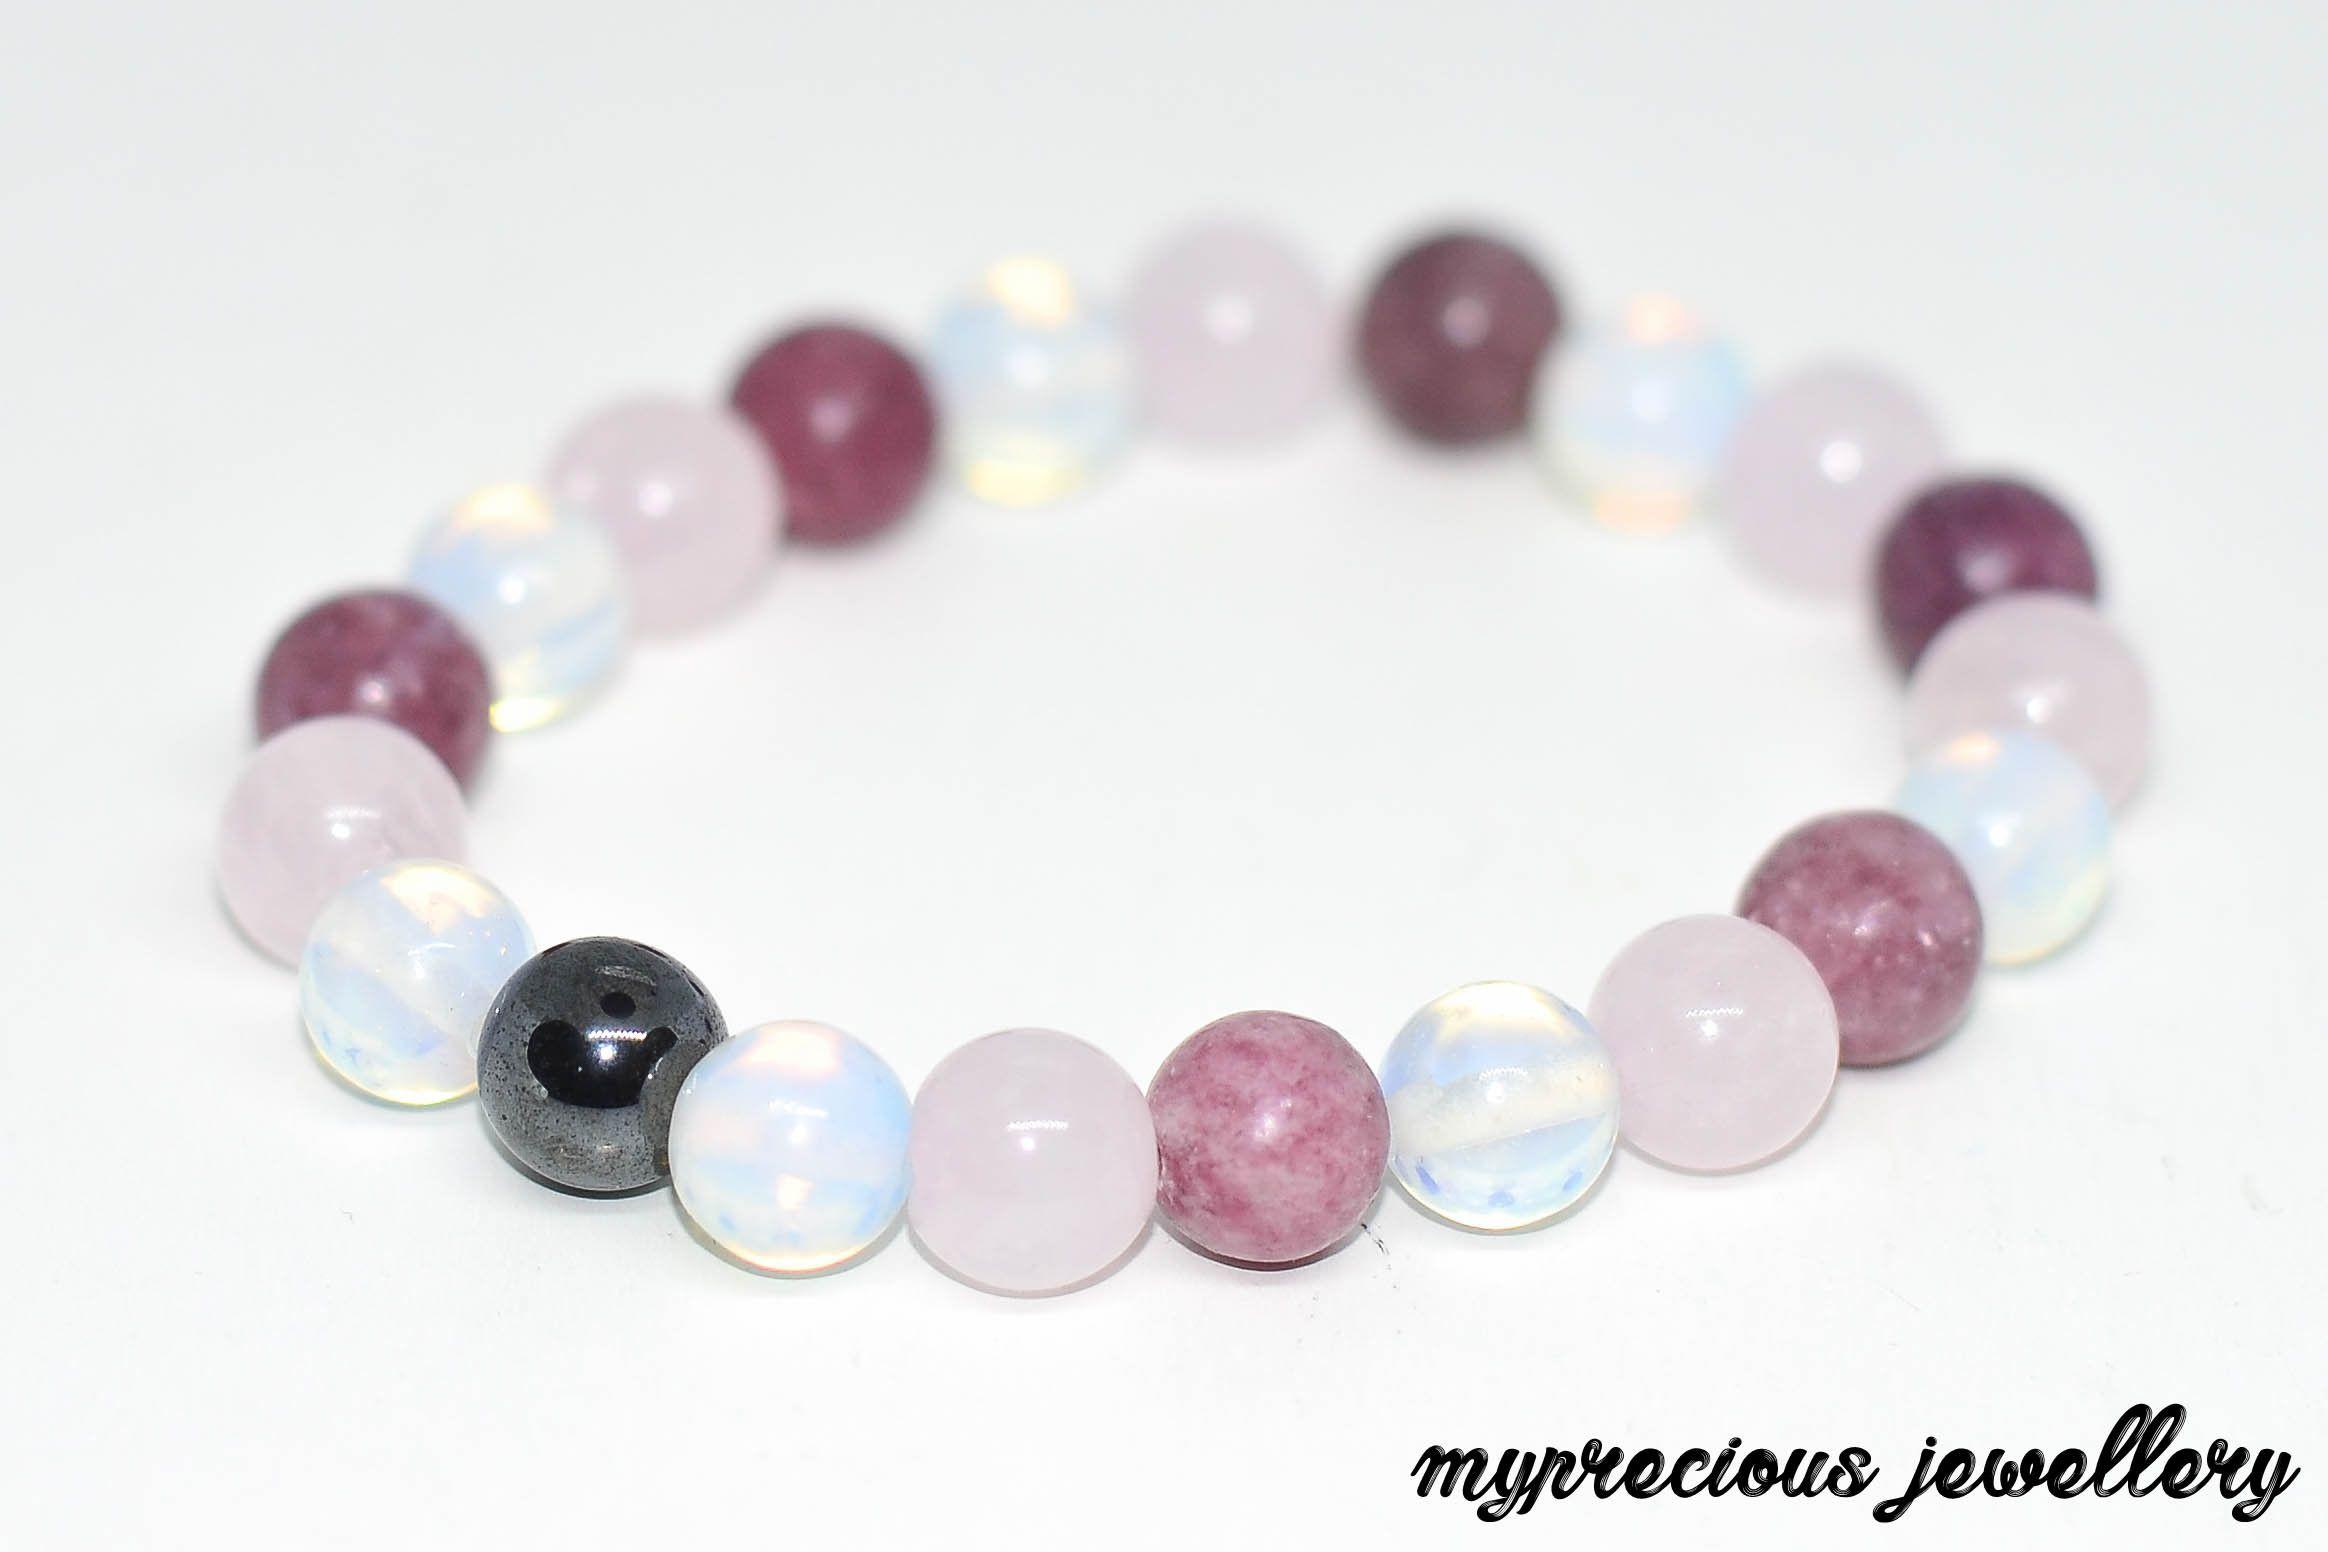 Gemstone Reiki Healing Love Gift Uk